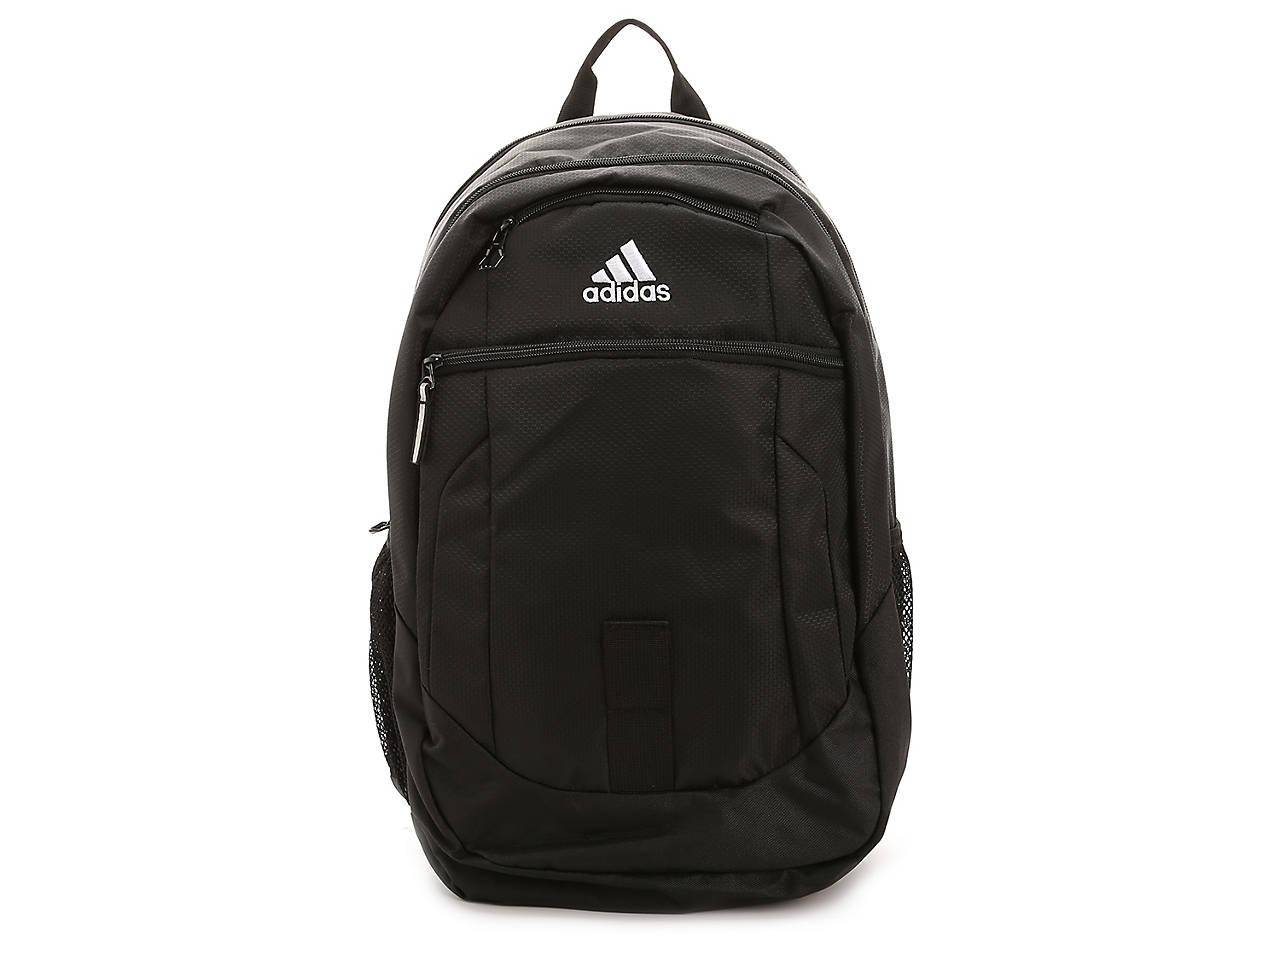 df0b66822c14 Adidas Backpack One Strap- Fenix Toulouse Handball